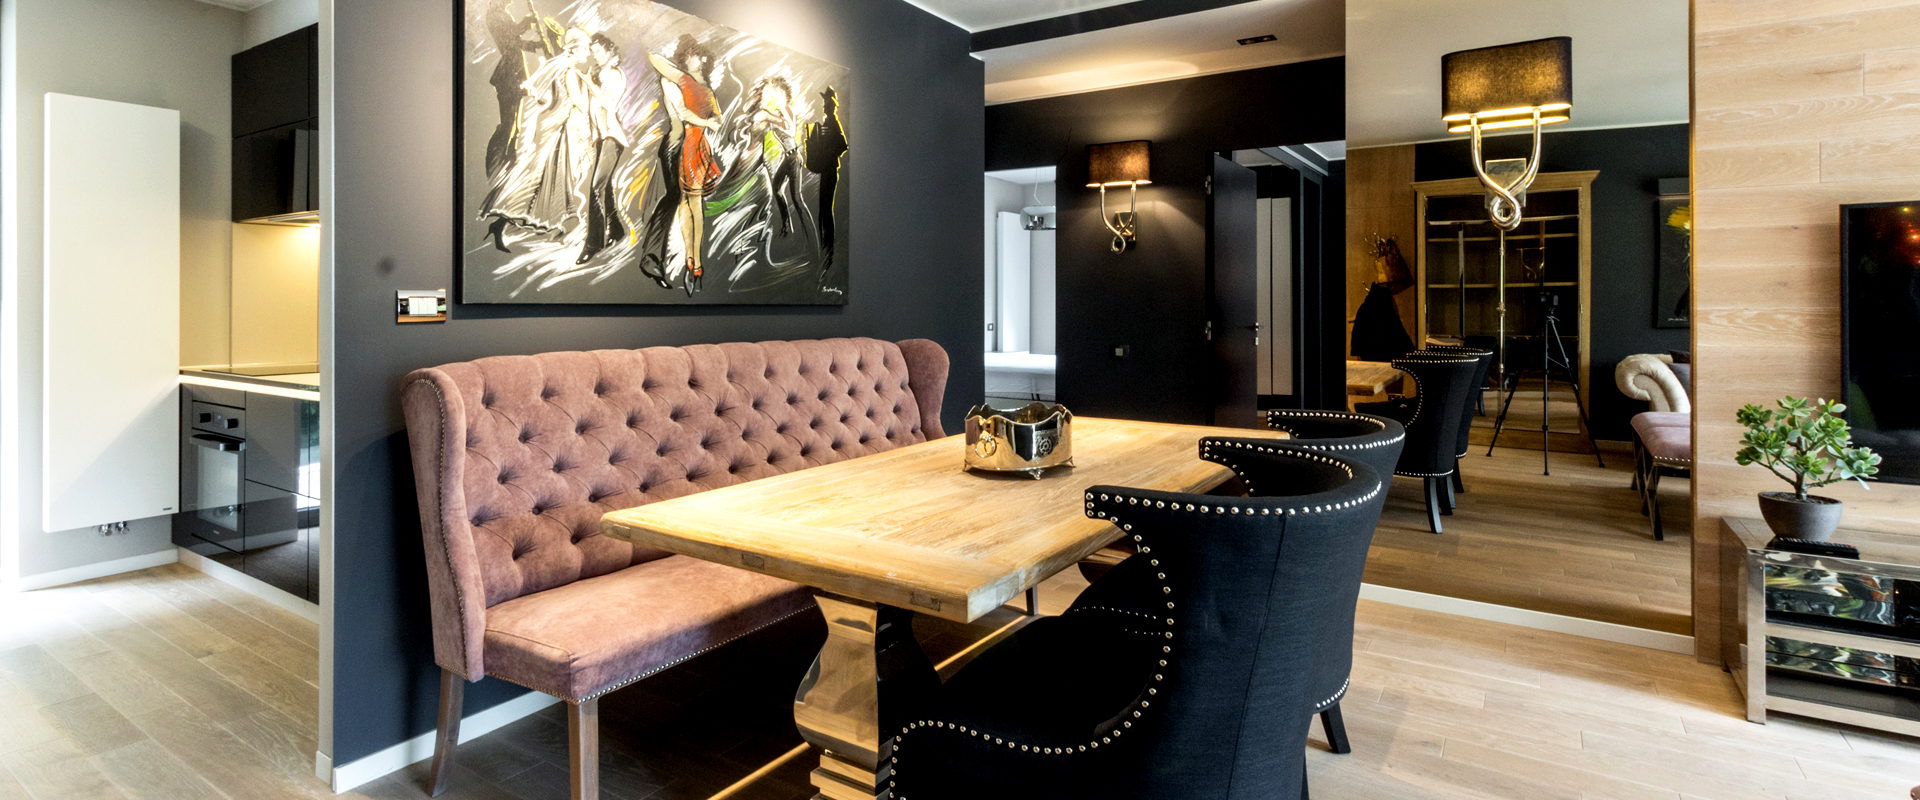 Inchiriere apartament 3 camere | Eleganta si stil | Dorobanti, Capitale [ID: 1048399]